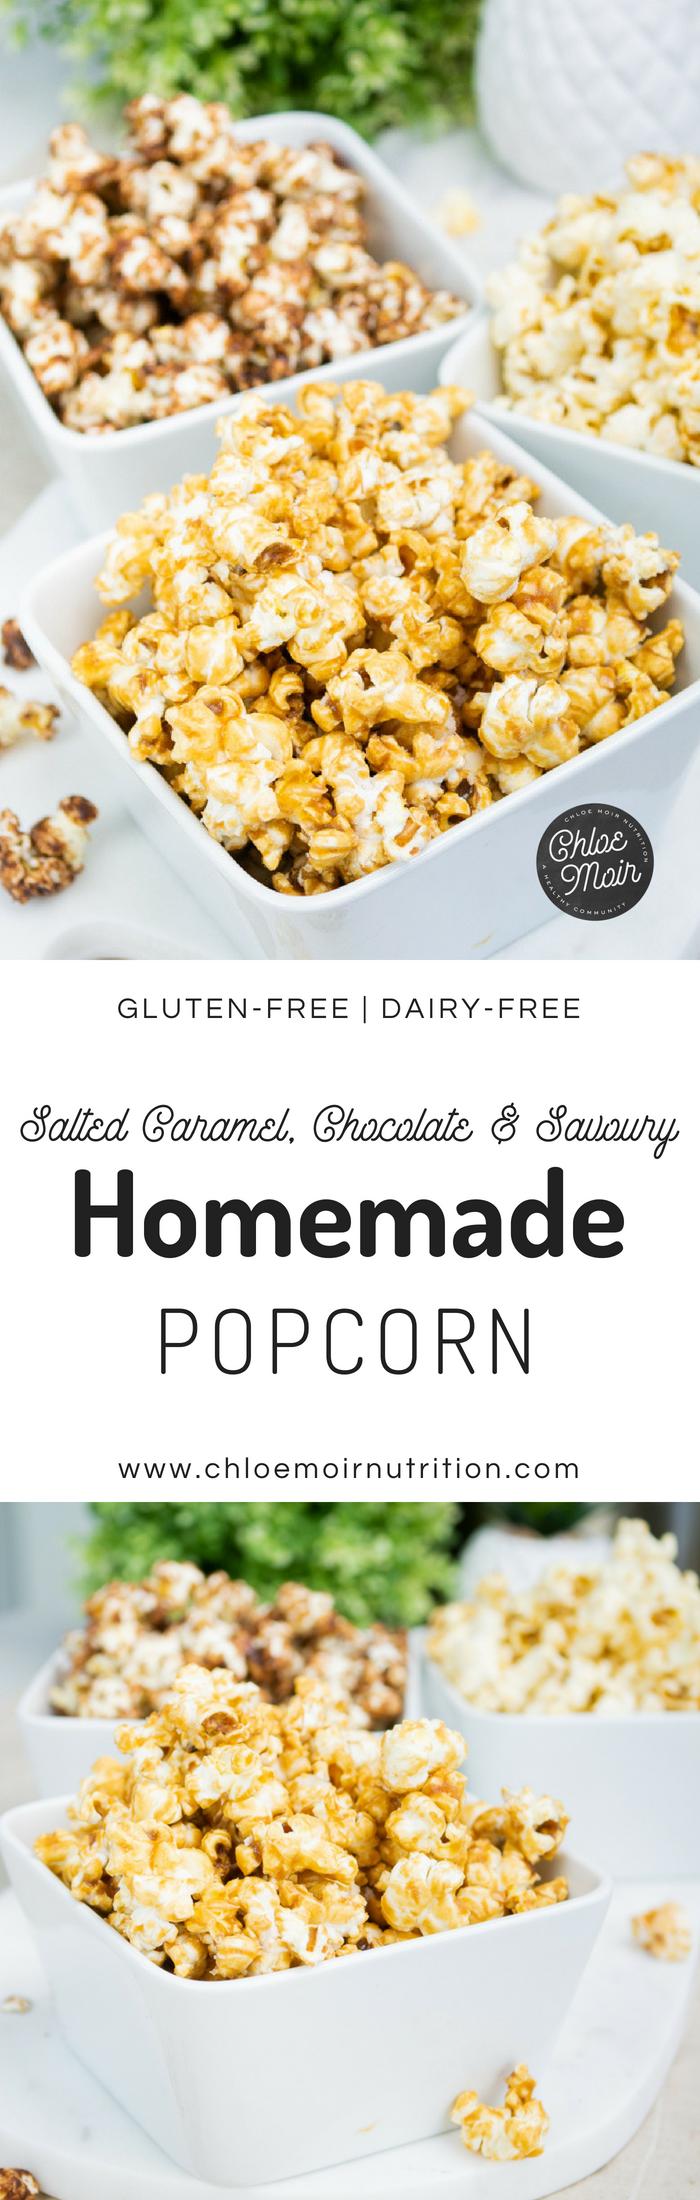 Salted Caramel, Chocolate and Savoury Popcorn